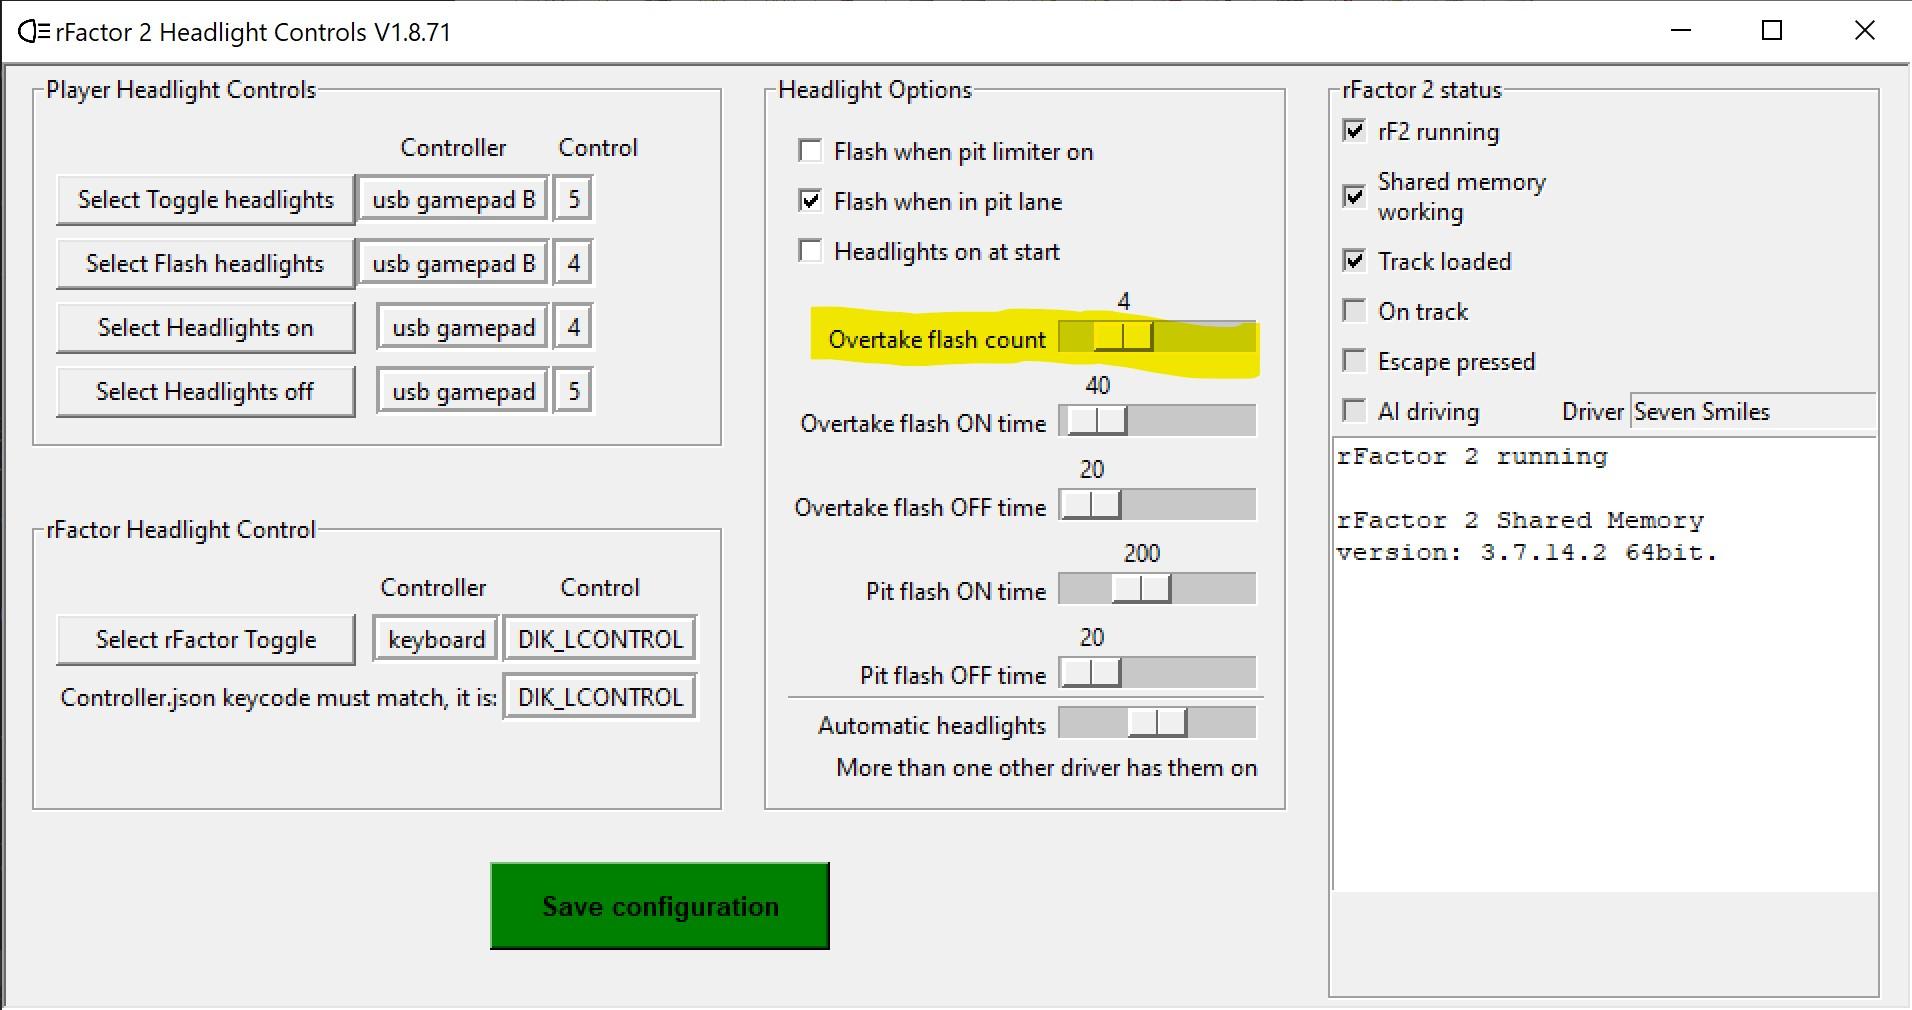 rF2headlights-1.8.71-hlite.jpg